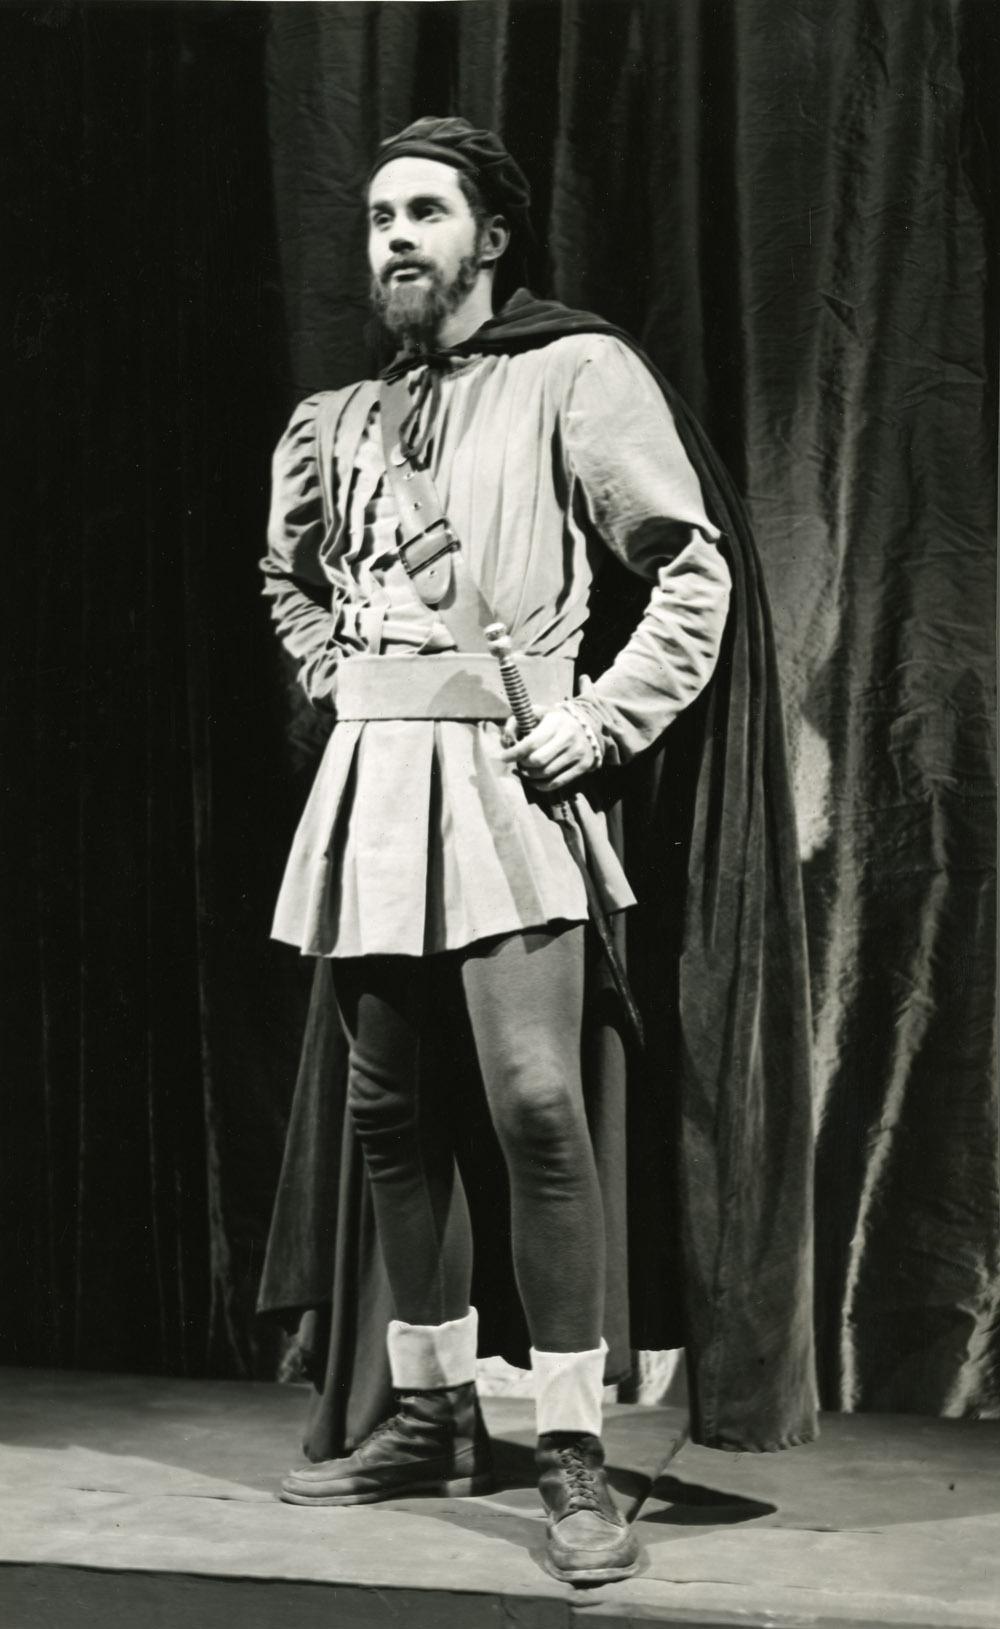 Romulus Linney as Iago